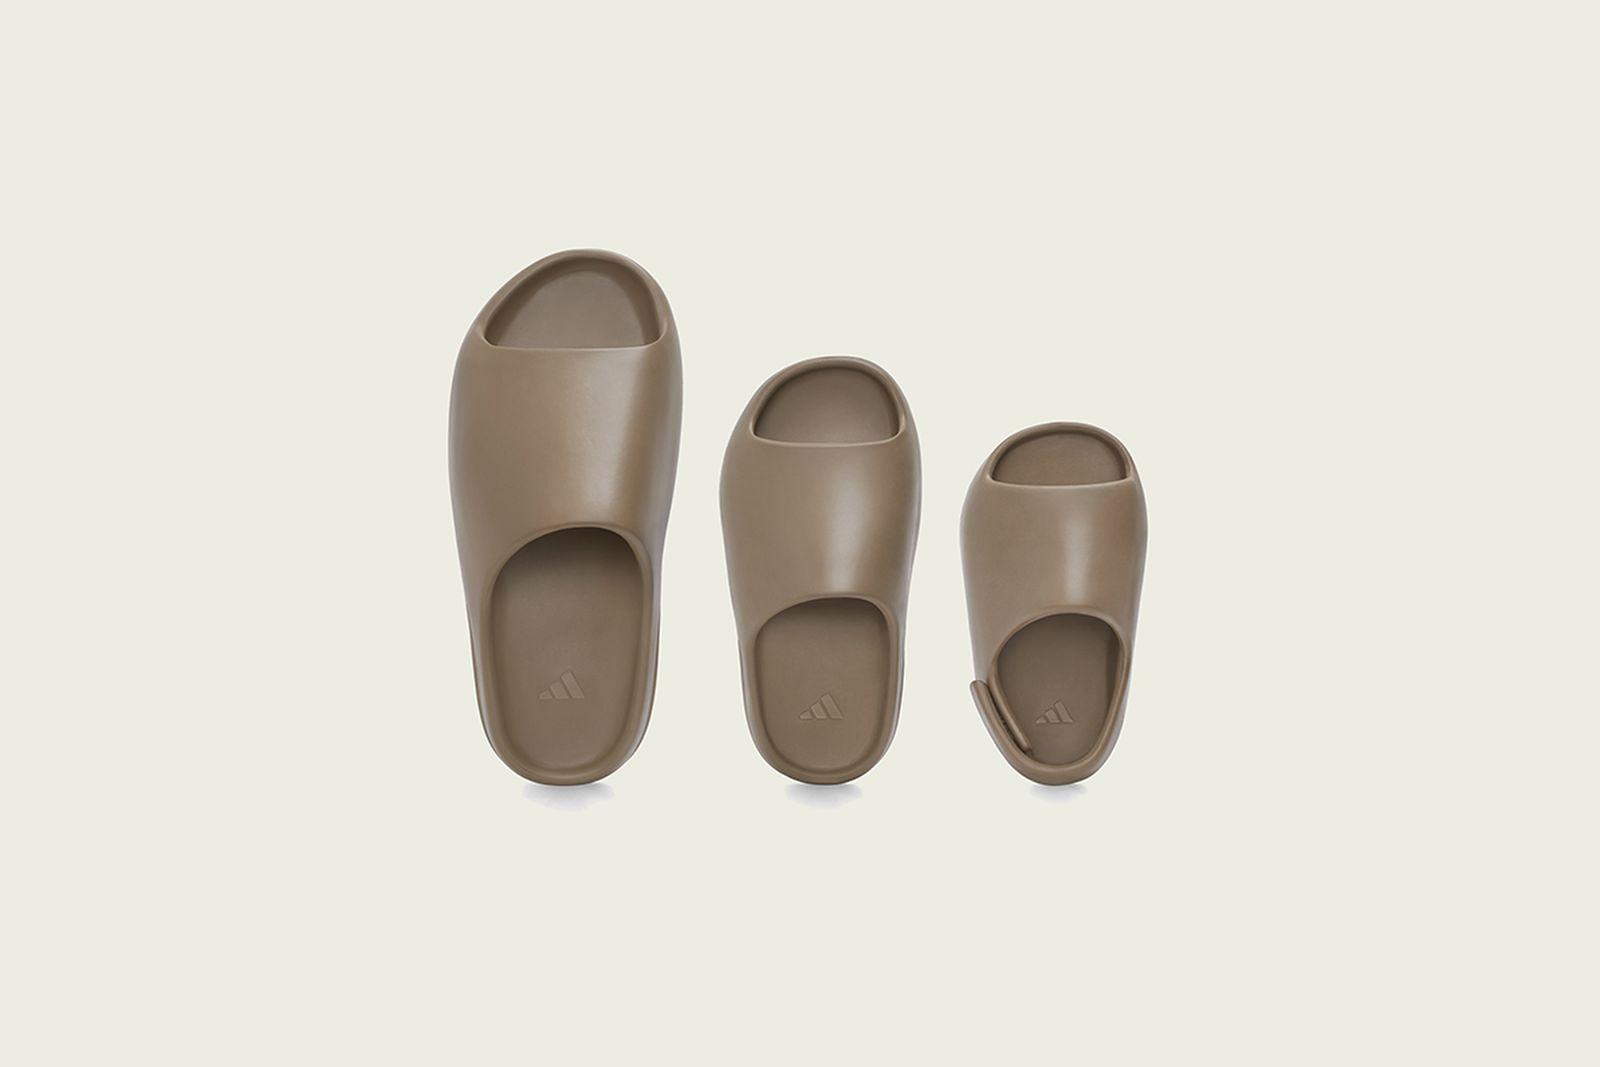 adidas-yeezy-slide-release-date-price-11